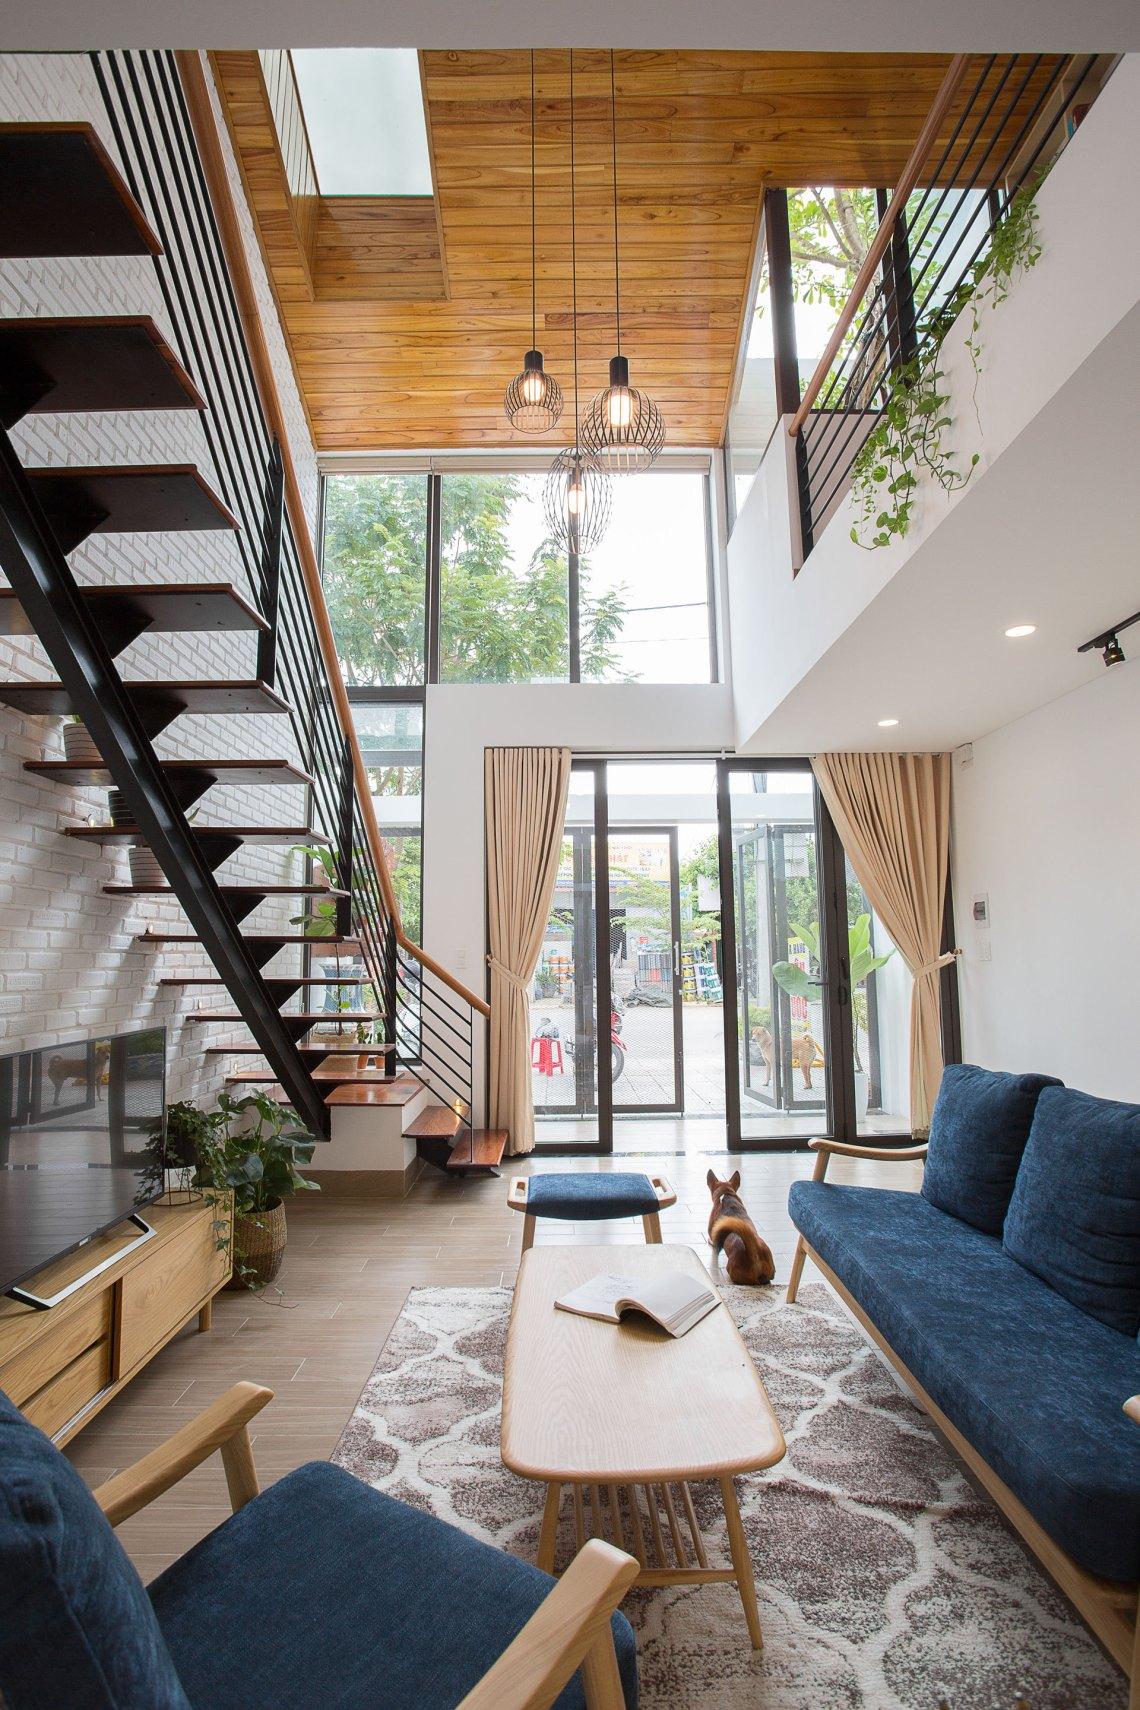 Gallery of Minimalist House / 85 Design - 5